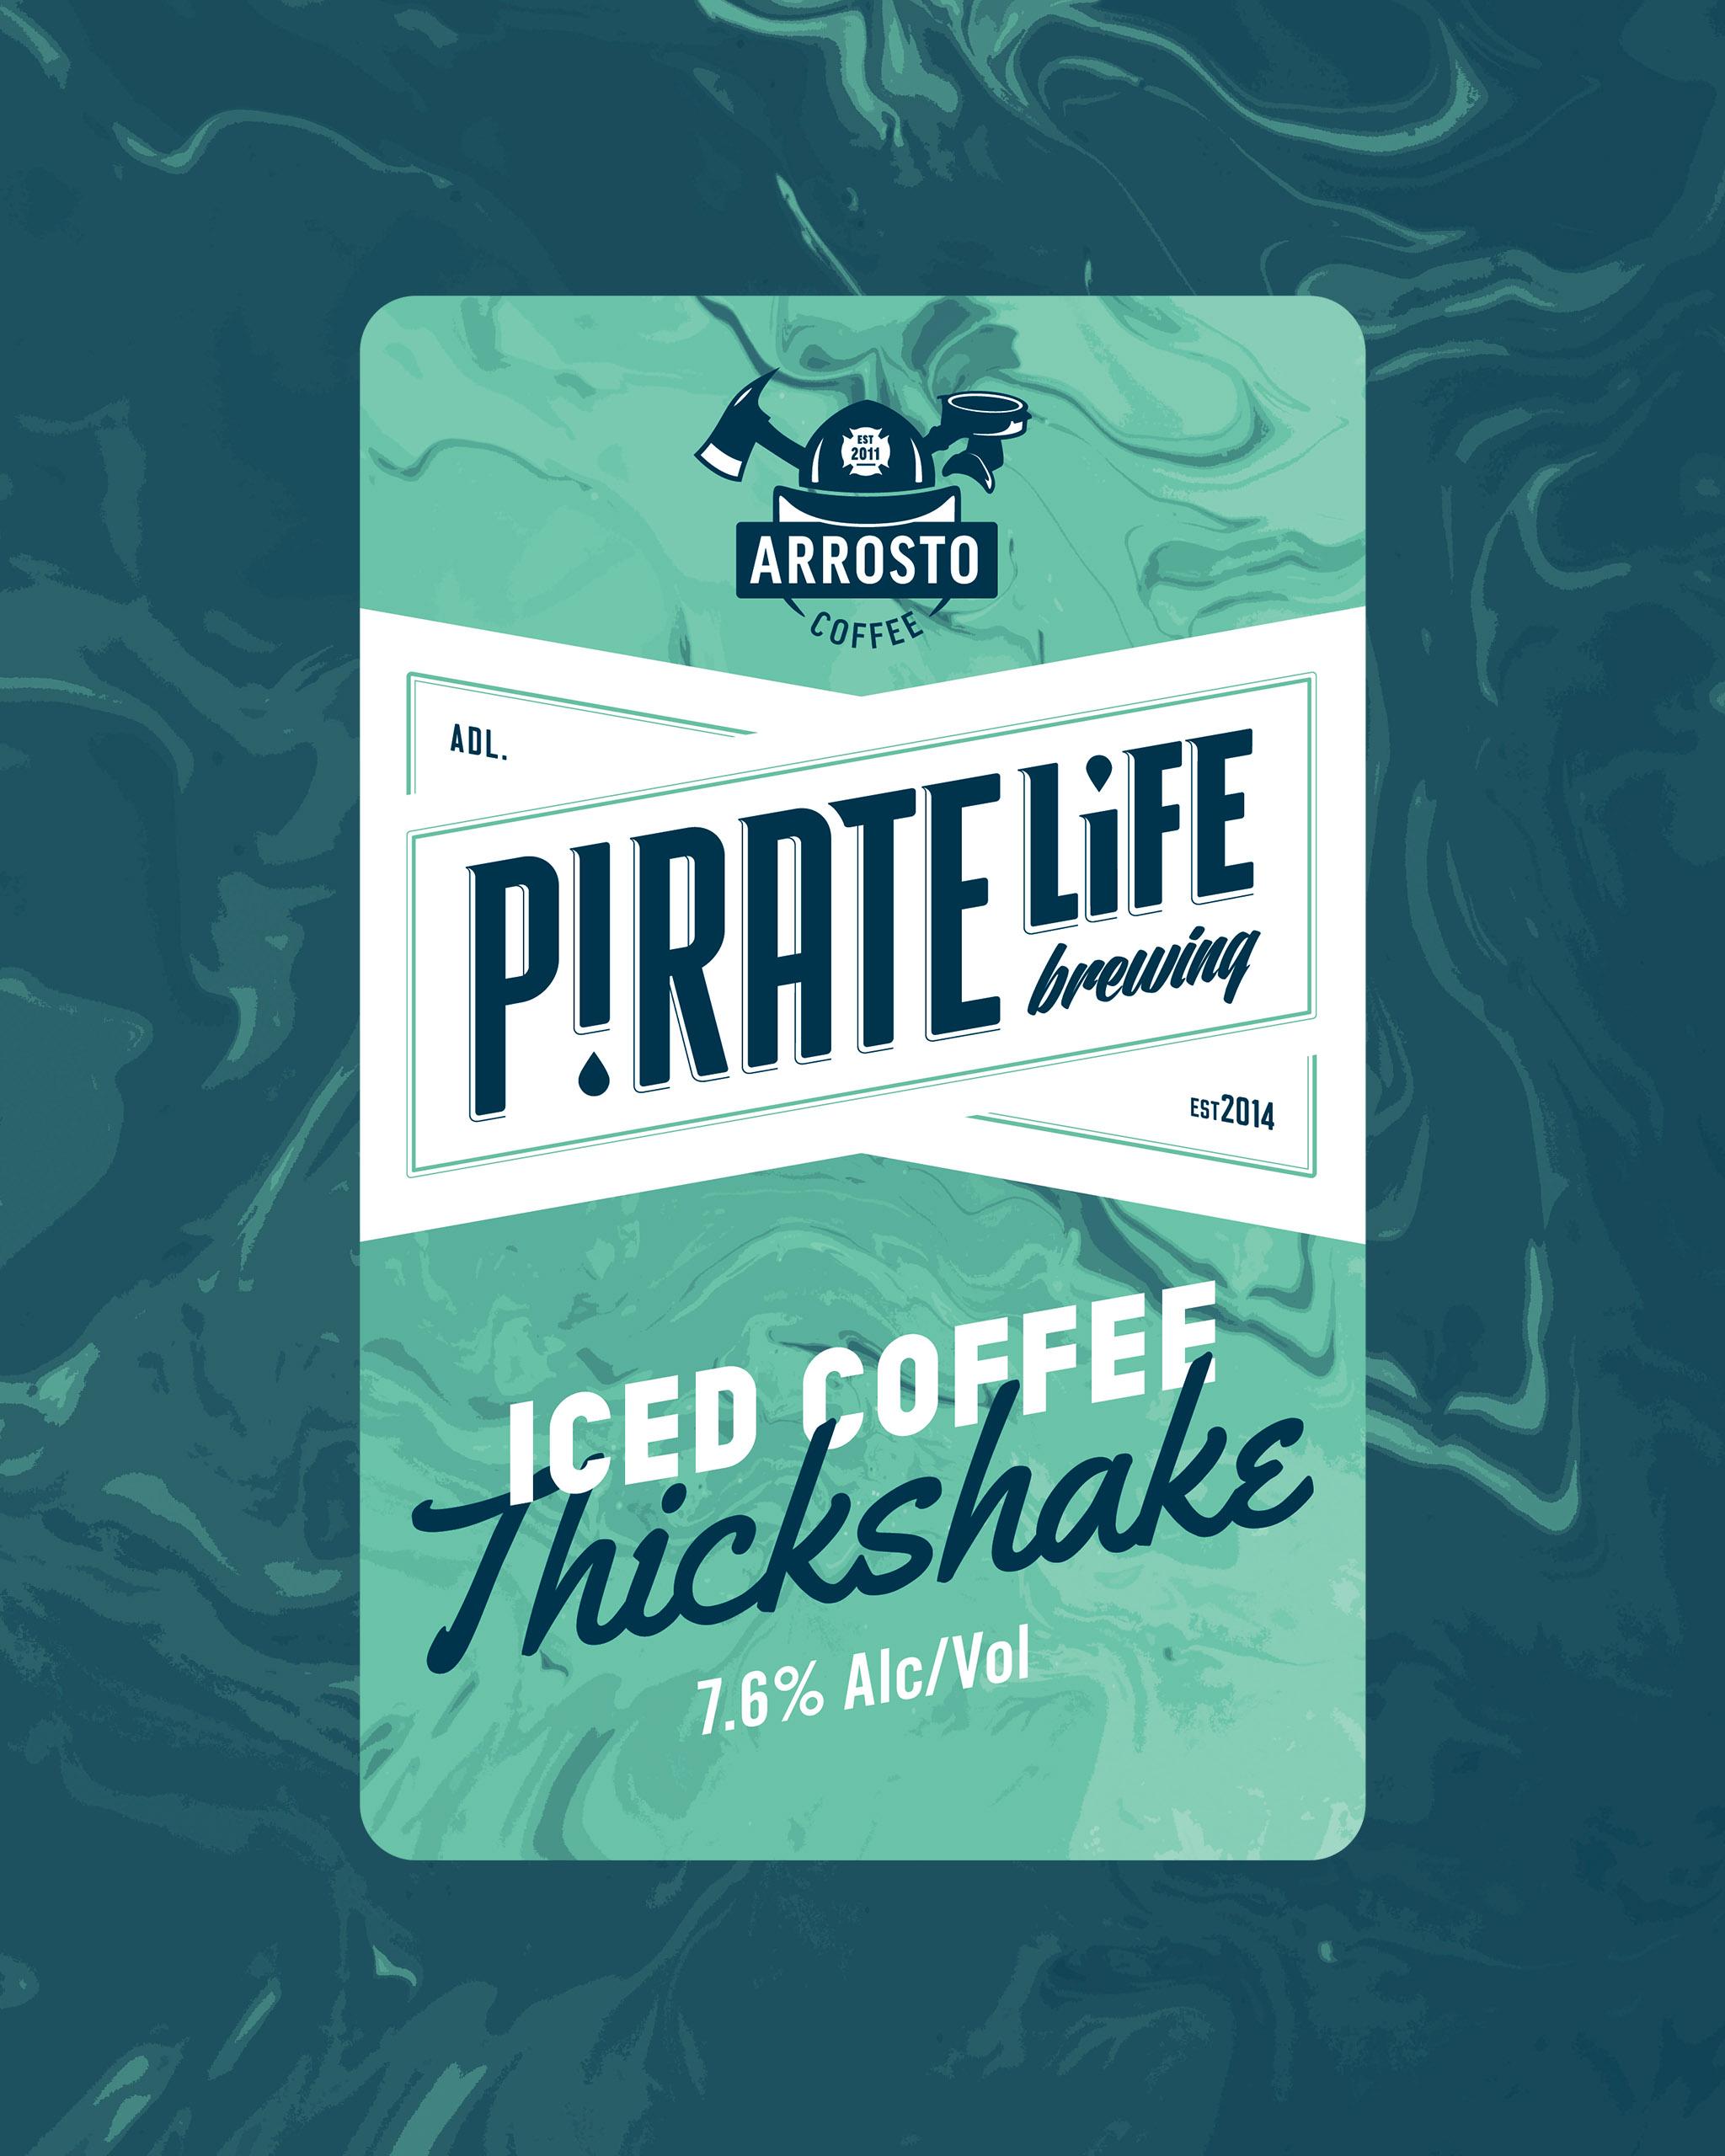 ICED COFFEE THICKSHAKE